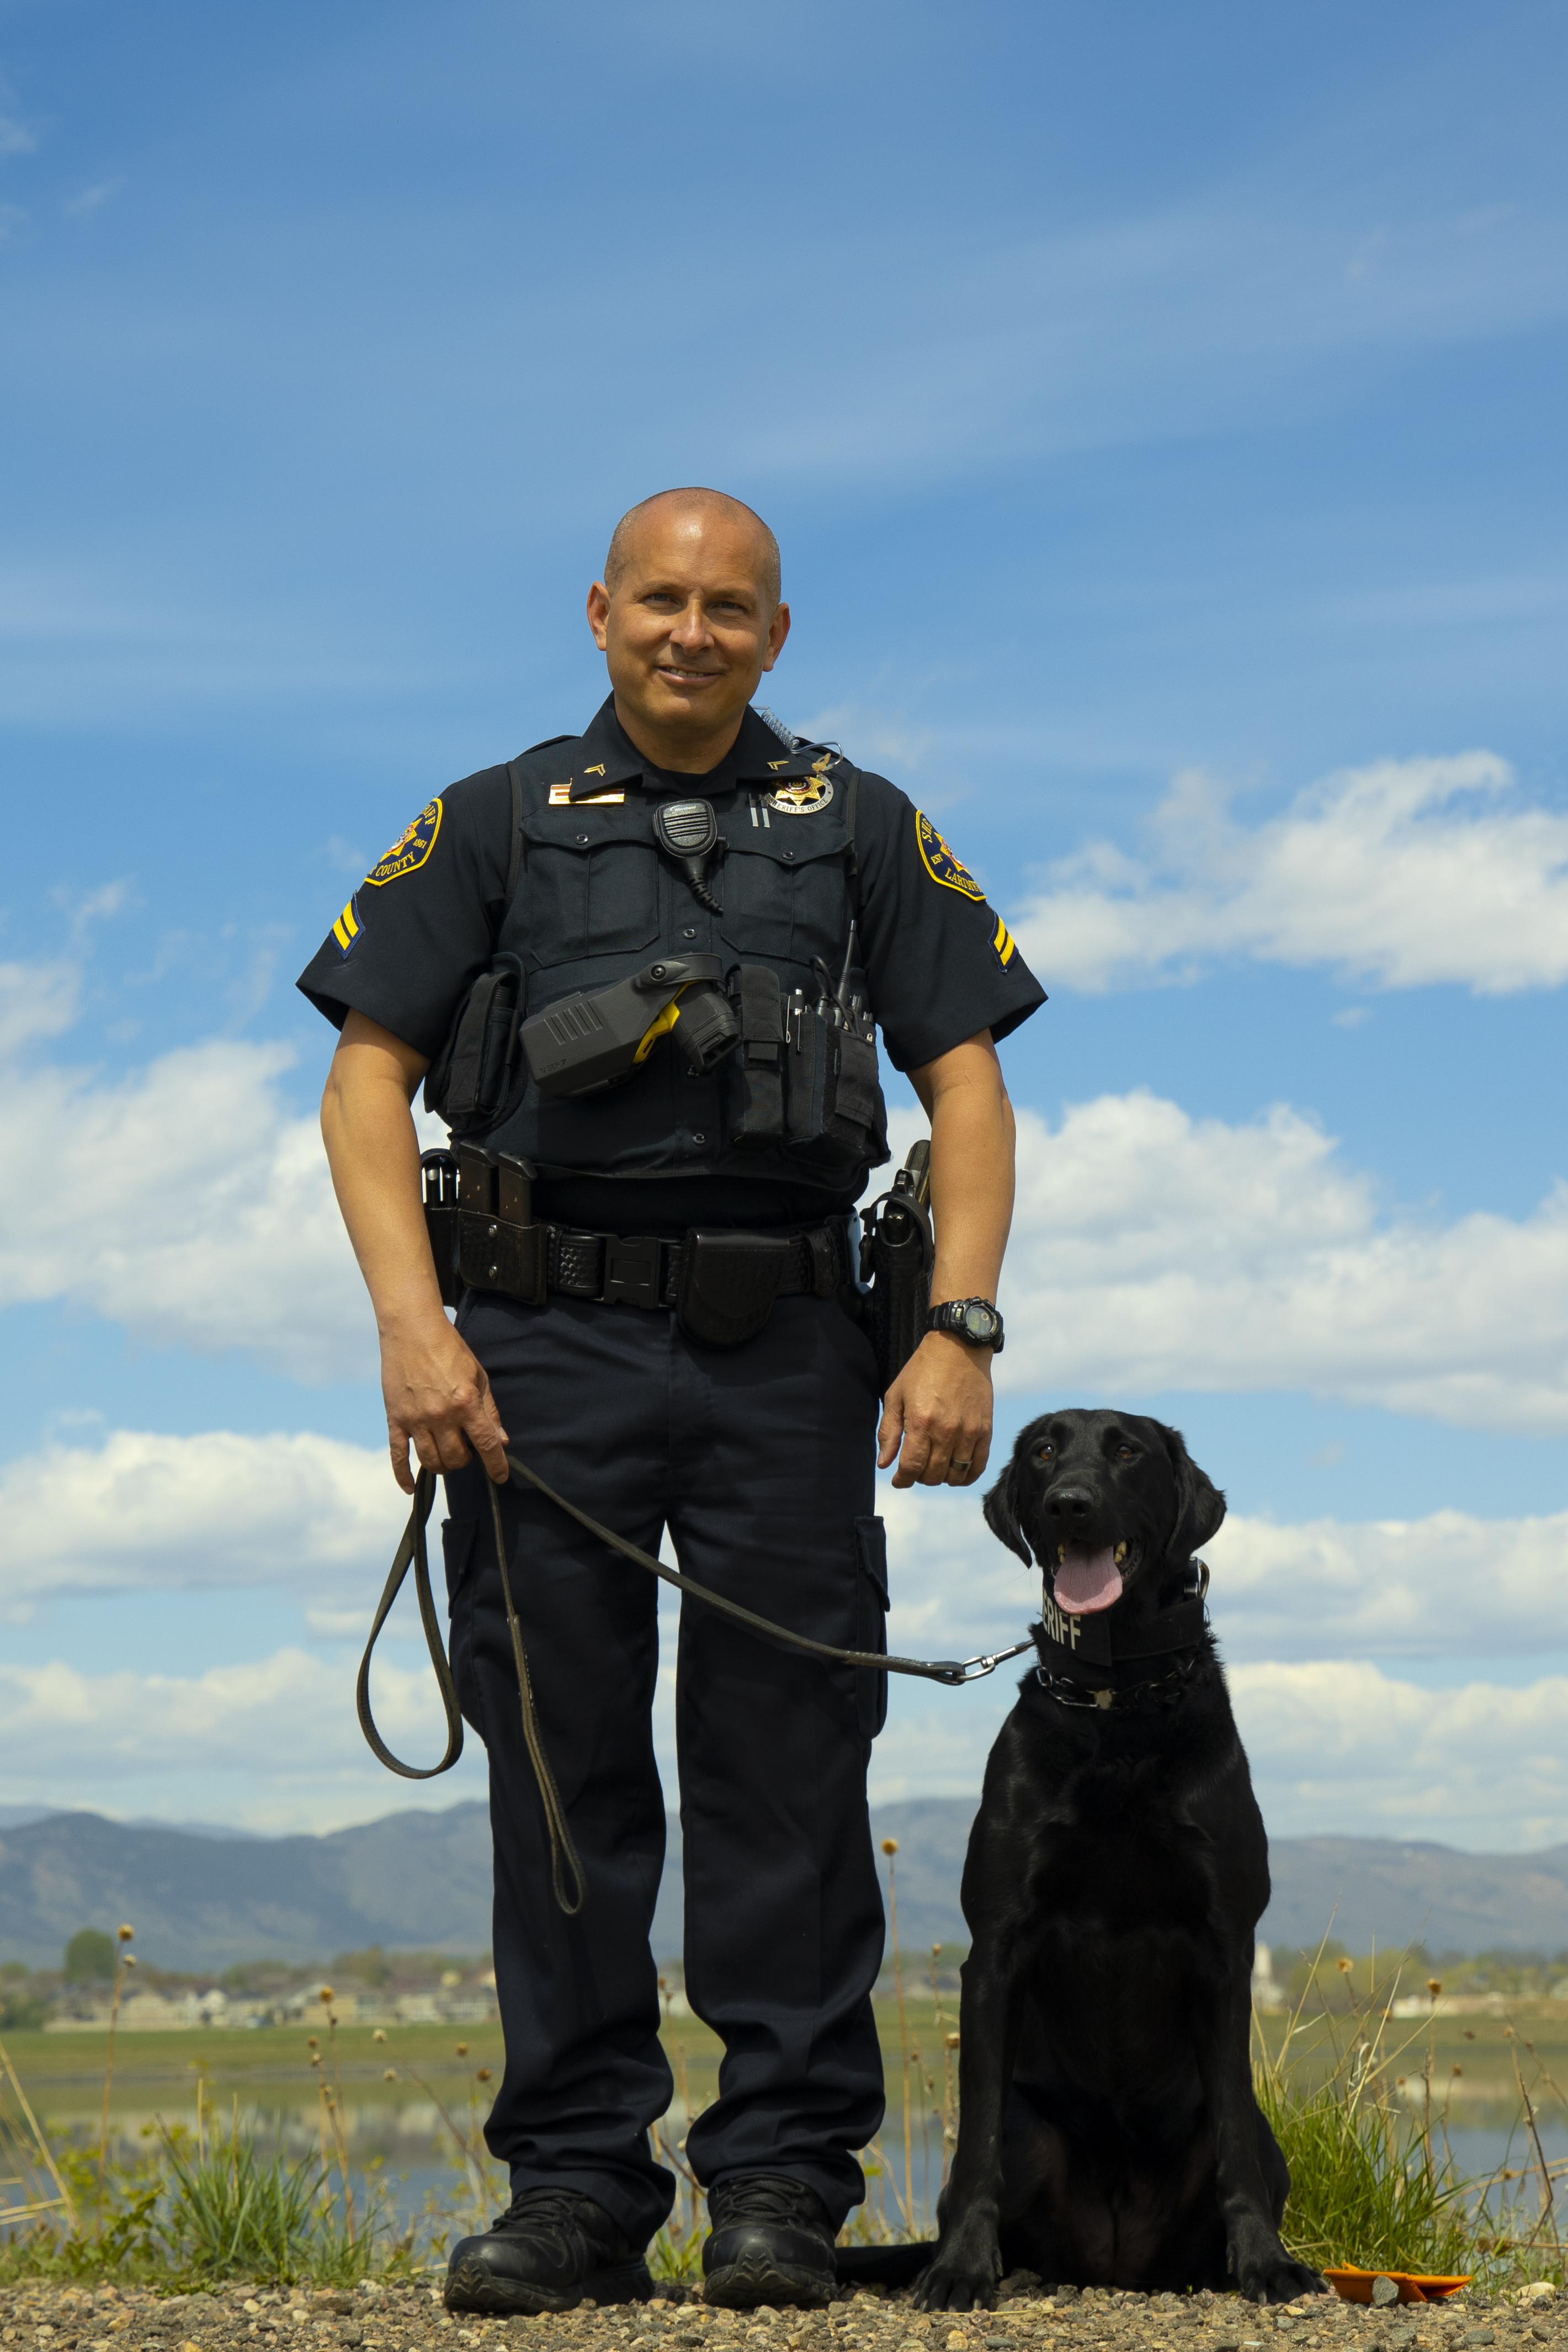 Image 4: Corporal Joe Pugliese and K9 Raven (Black Lab)